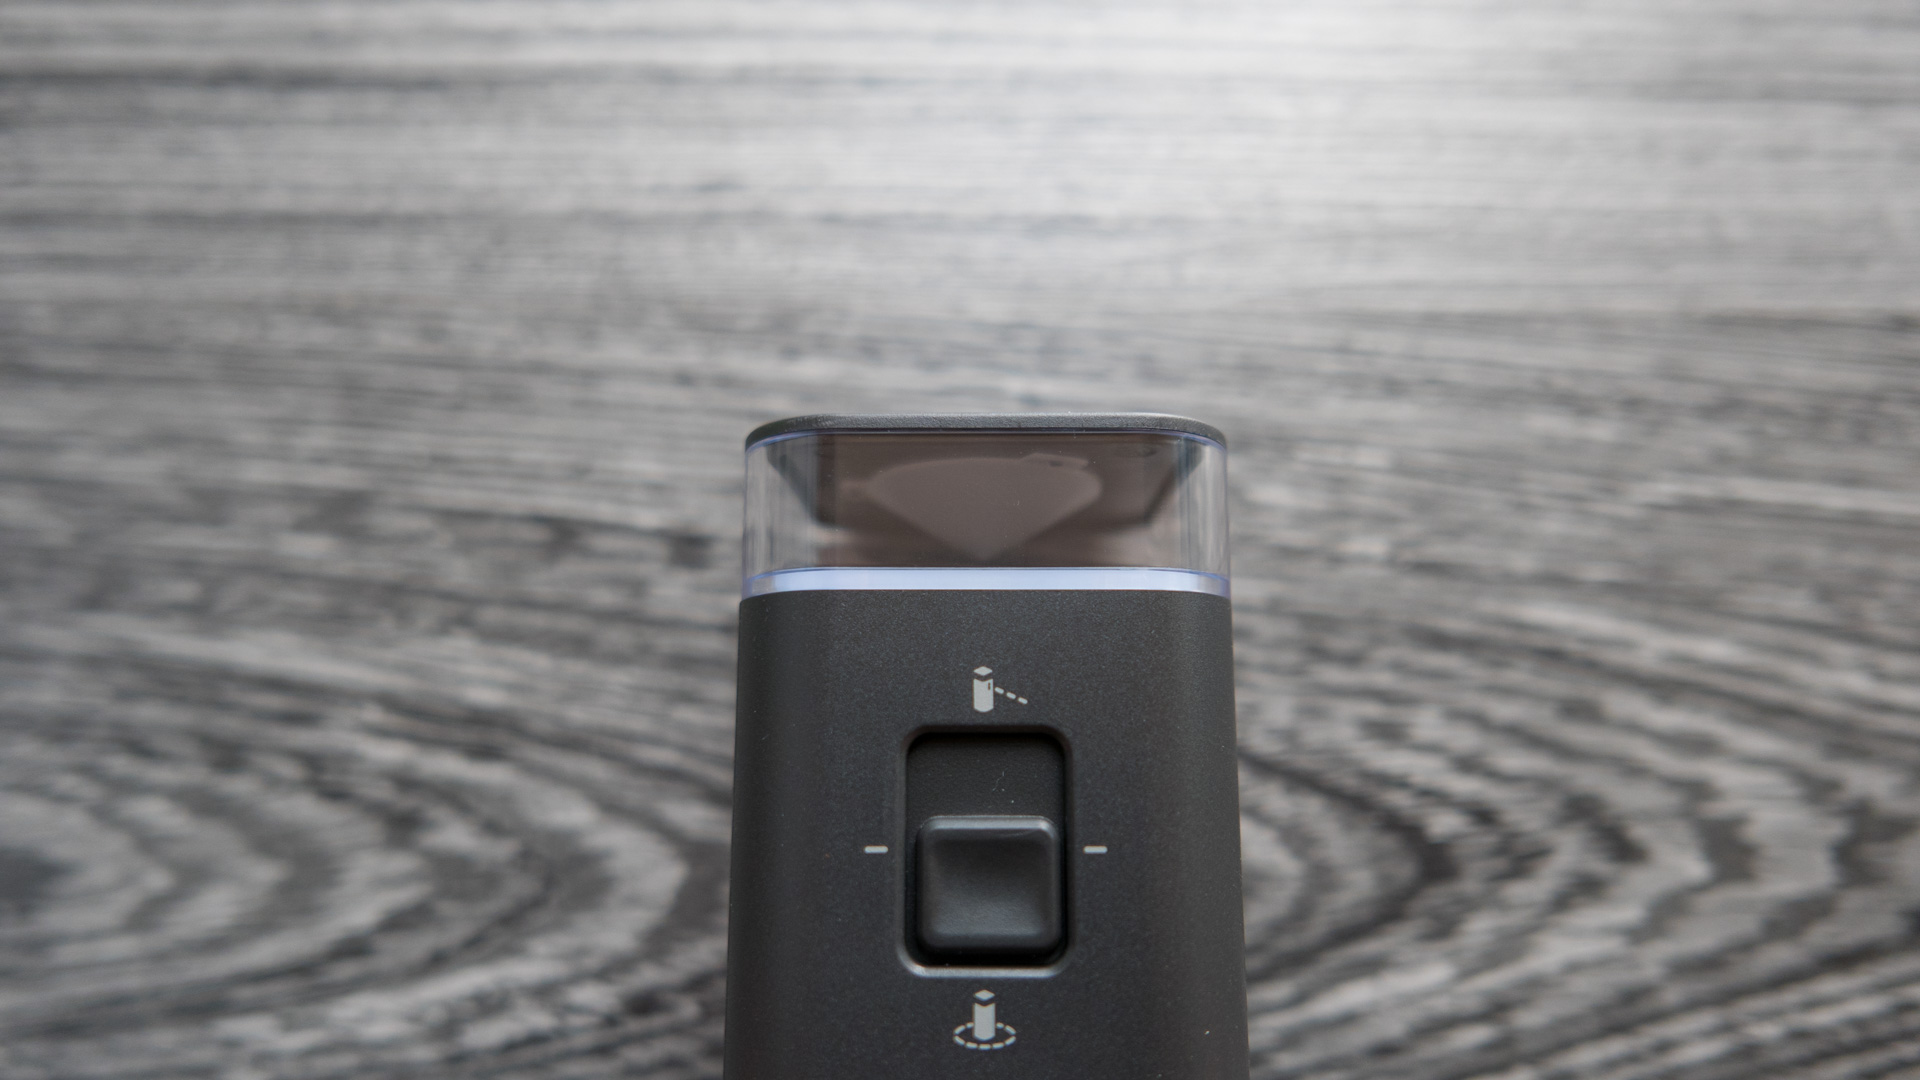 iRobot Roomba 980 Virtual Wall 10